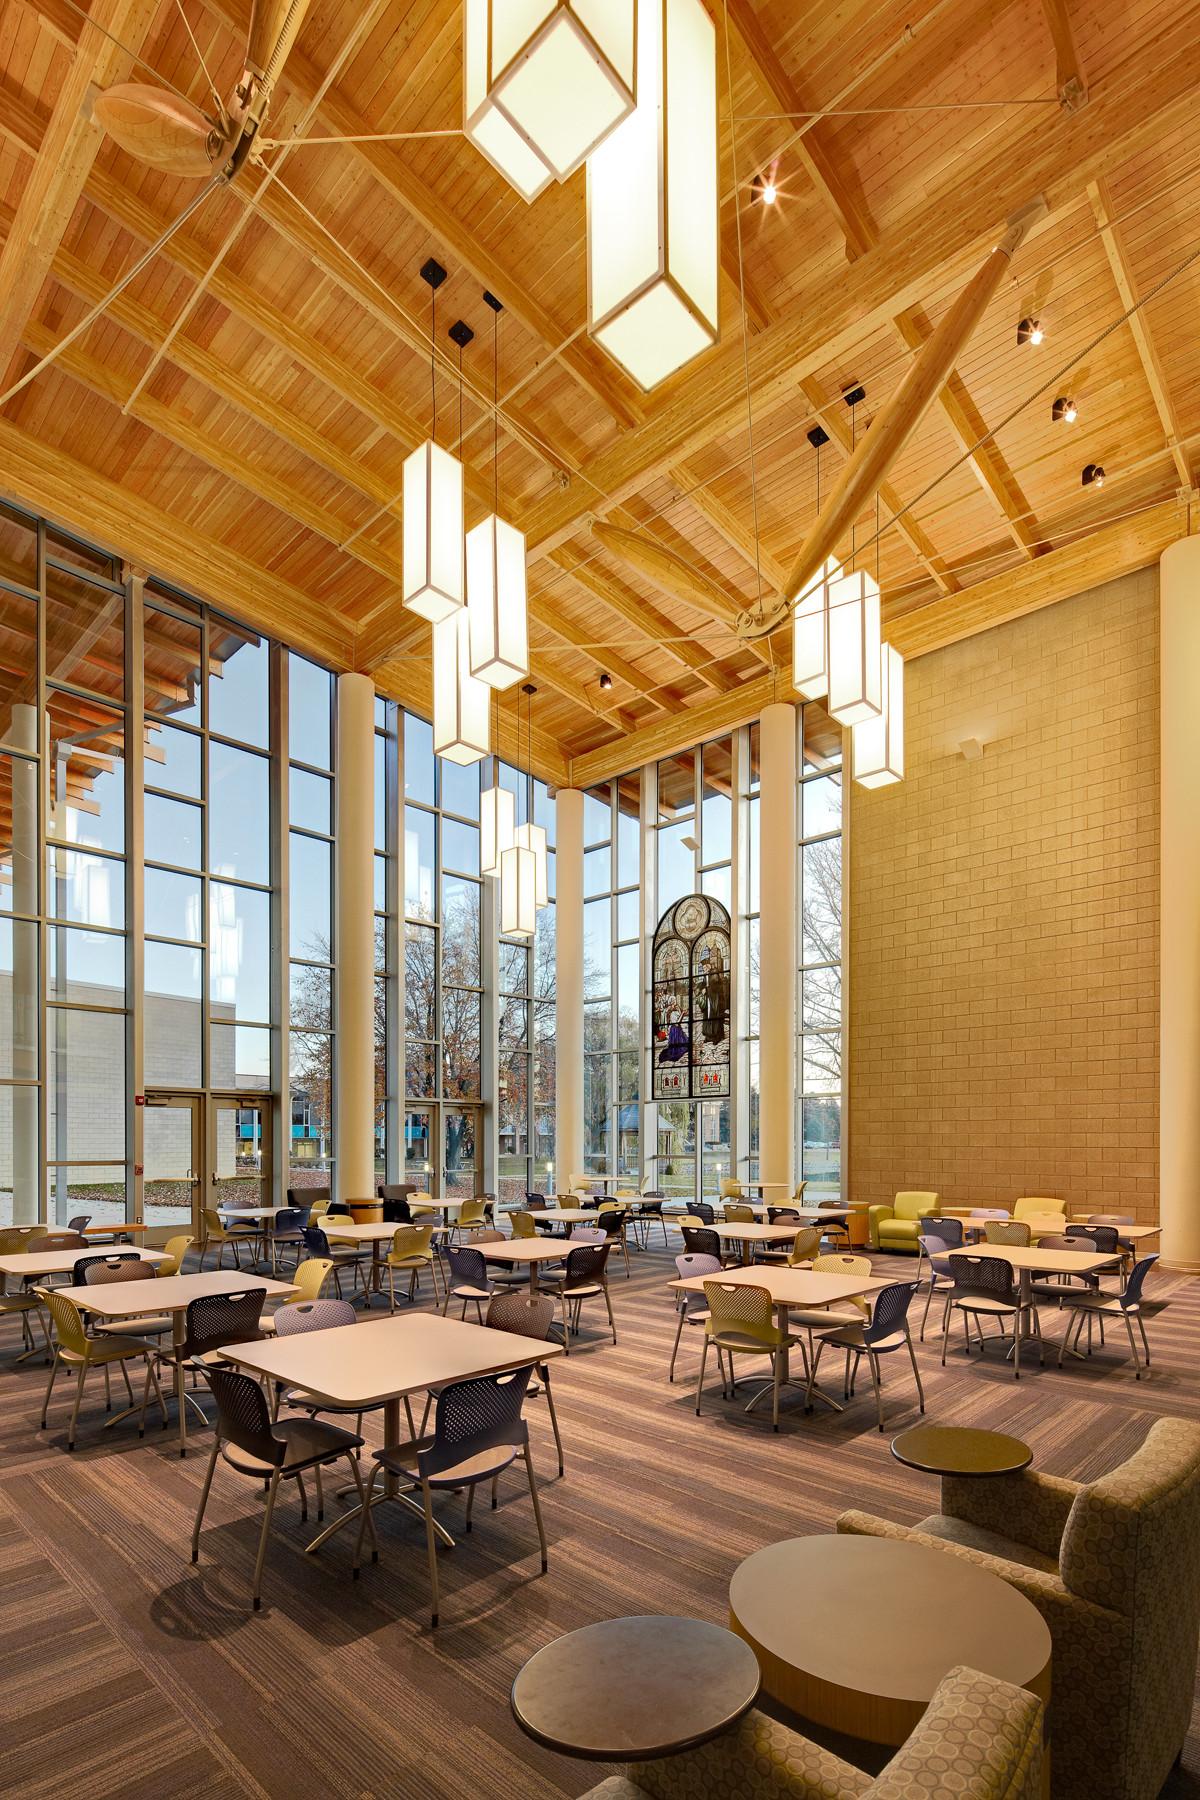 Madonna University - Franciscan Center for Science and Media / SmithGroupJJR